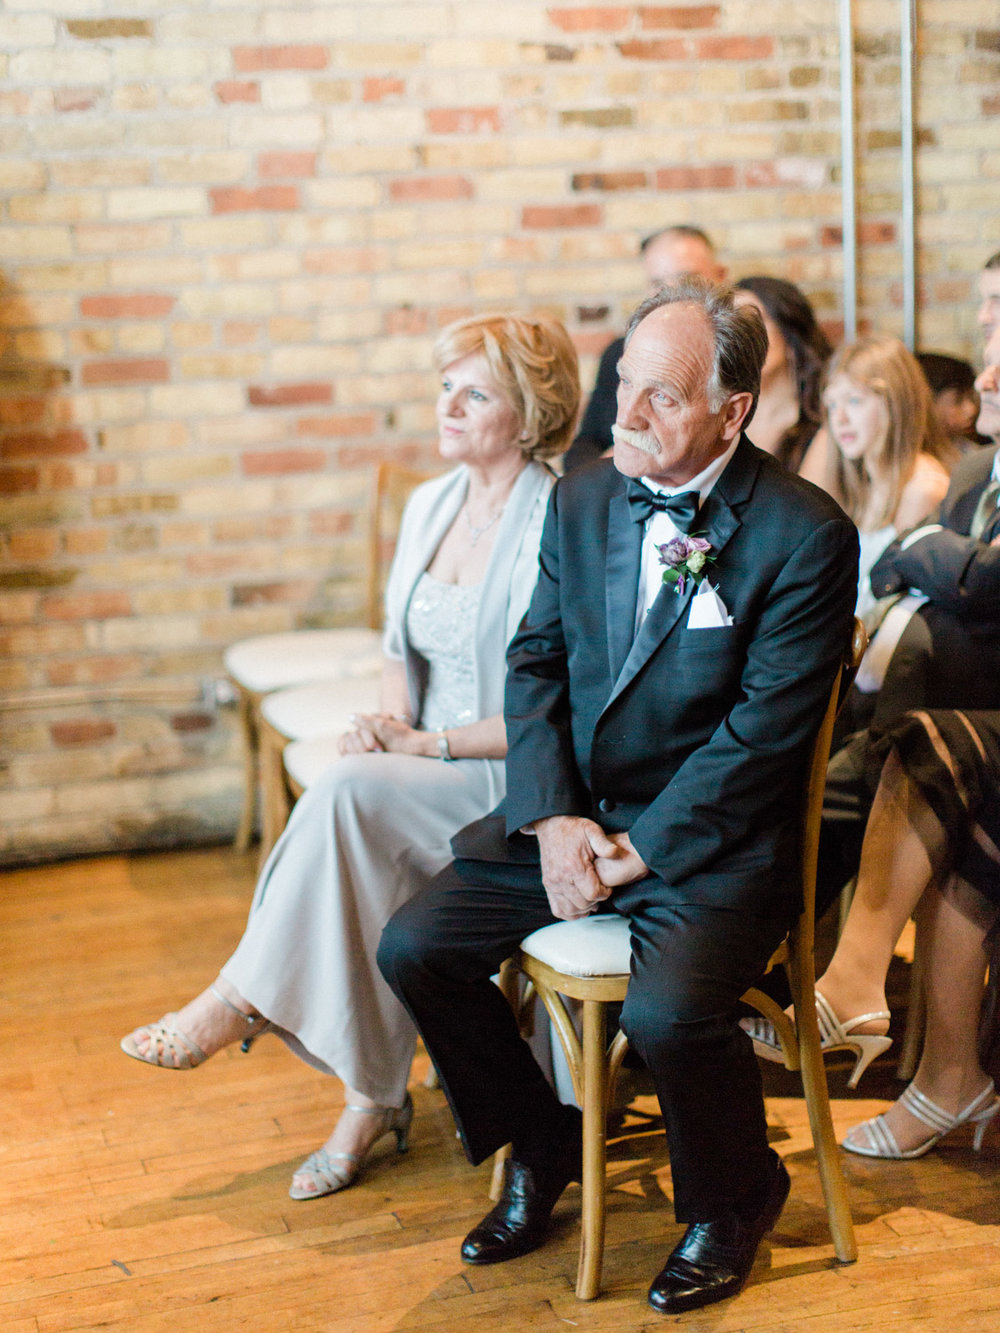 corynn-fowler-photography-toronto-collingwood-destination-wedding-photographer-454.jpg